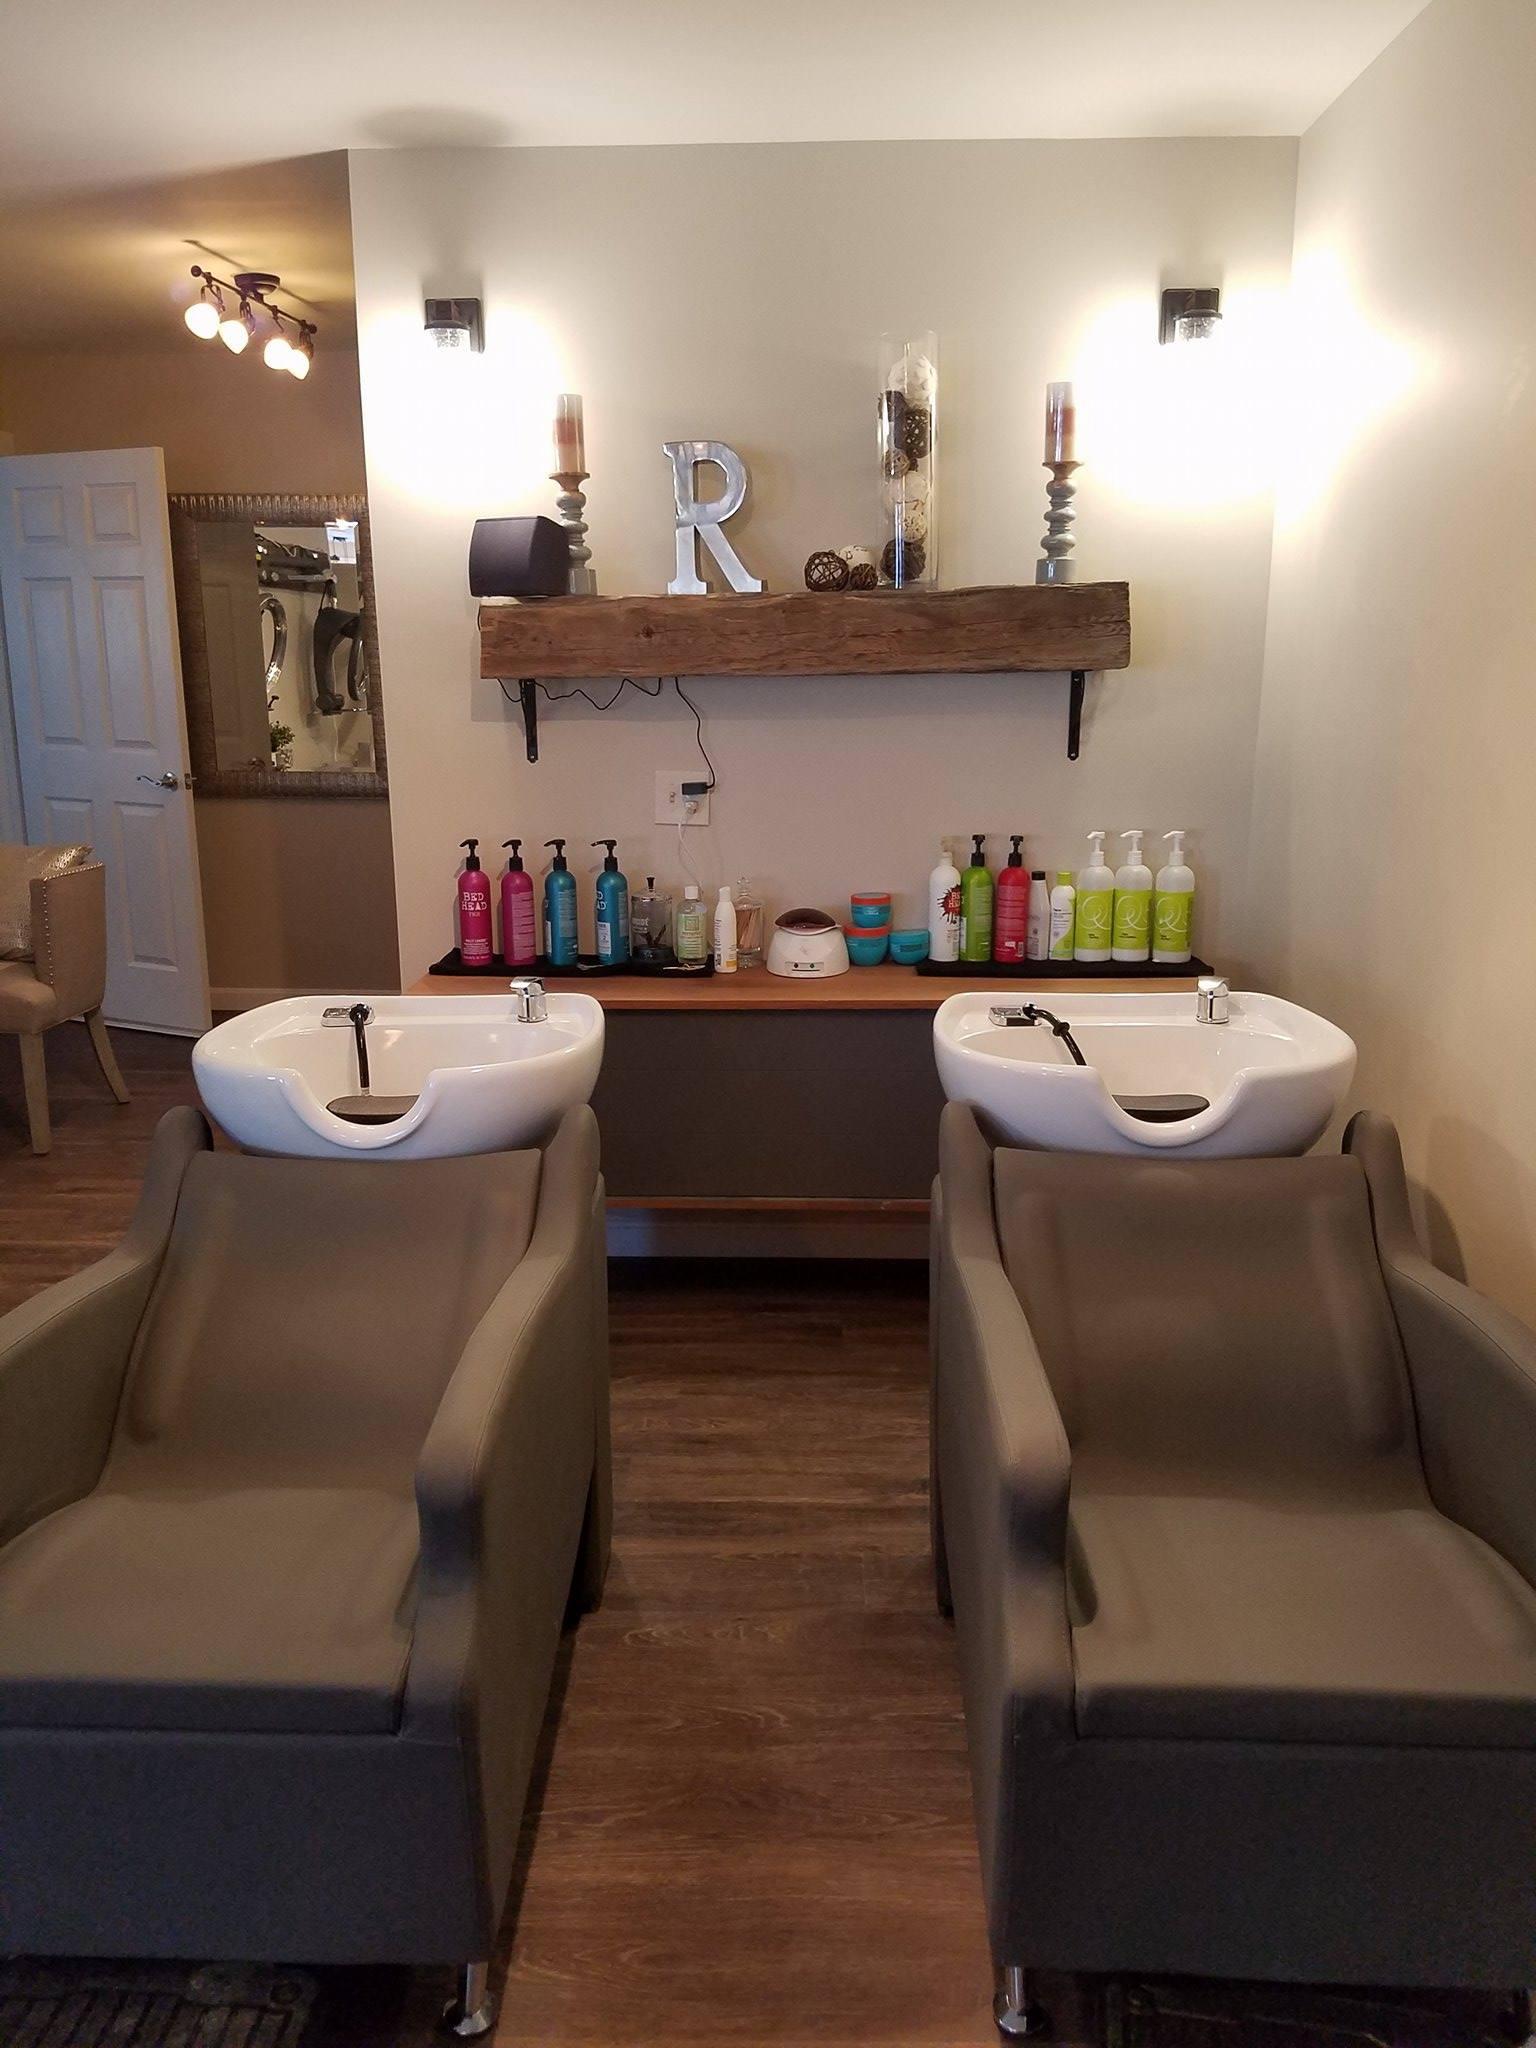 Revive Salon & Spa Washing Stations